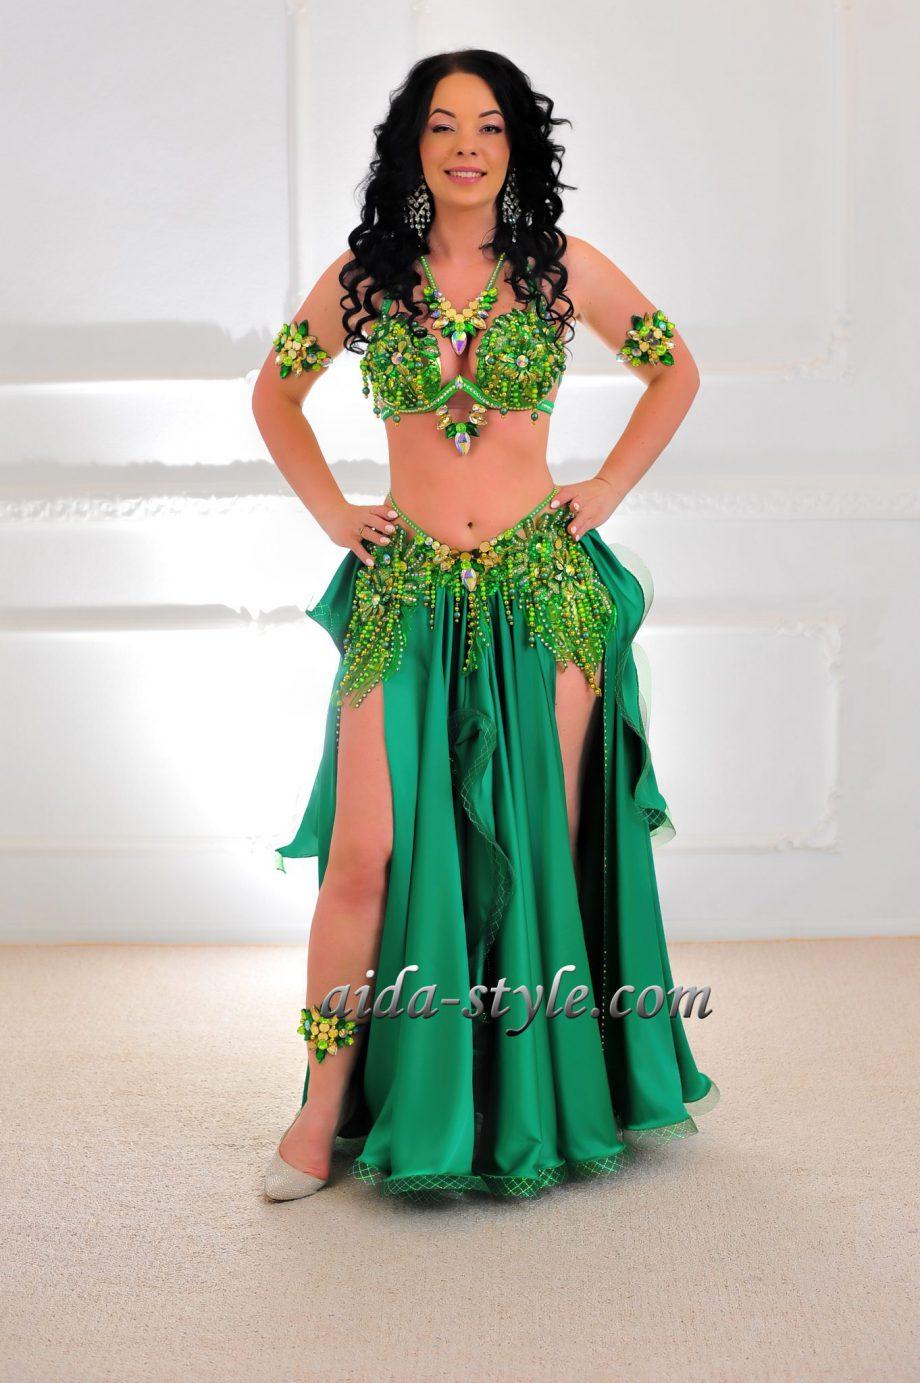 belly dance costumes women green